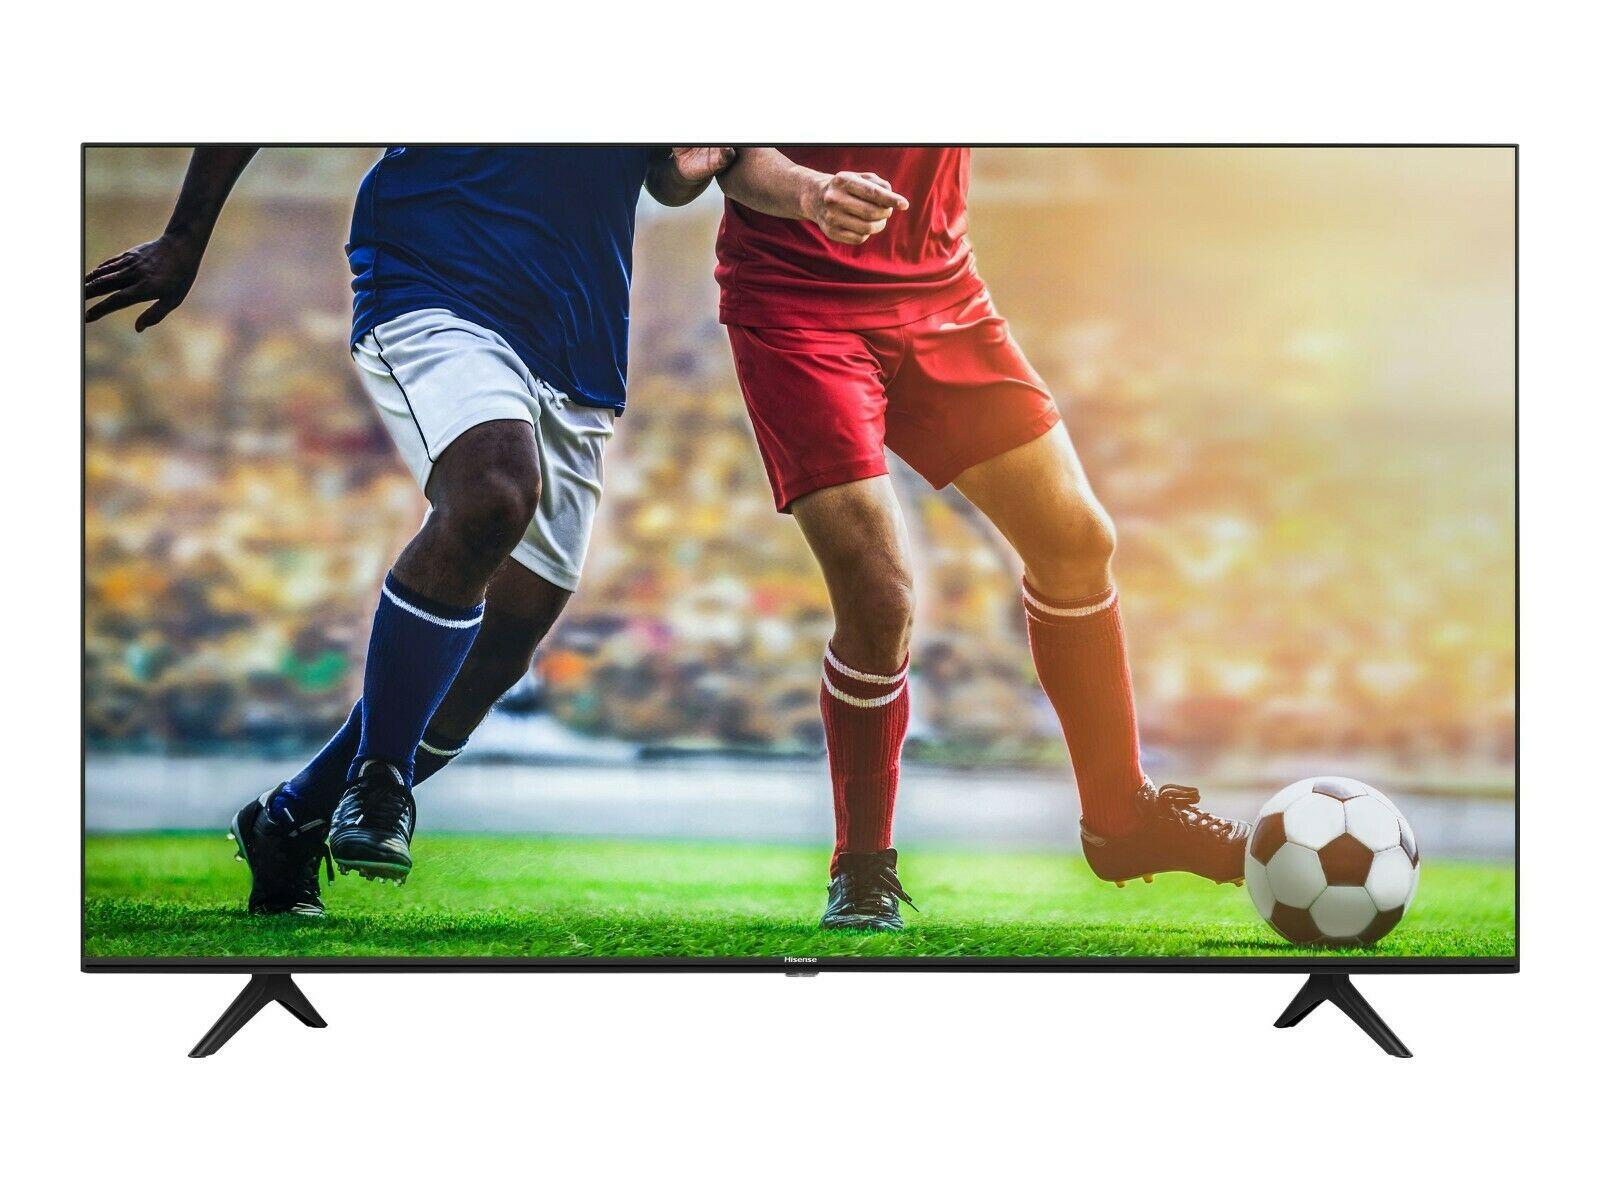 Codice Sconto Smart Tv Hisense 43″ 4K HDR 287€